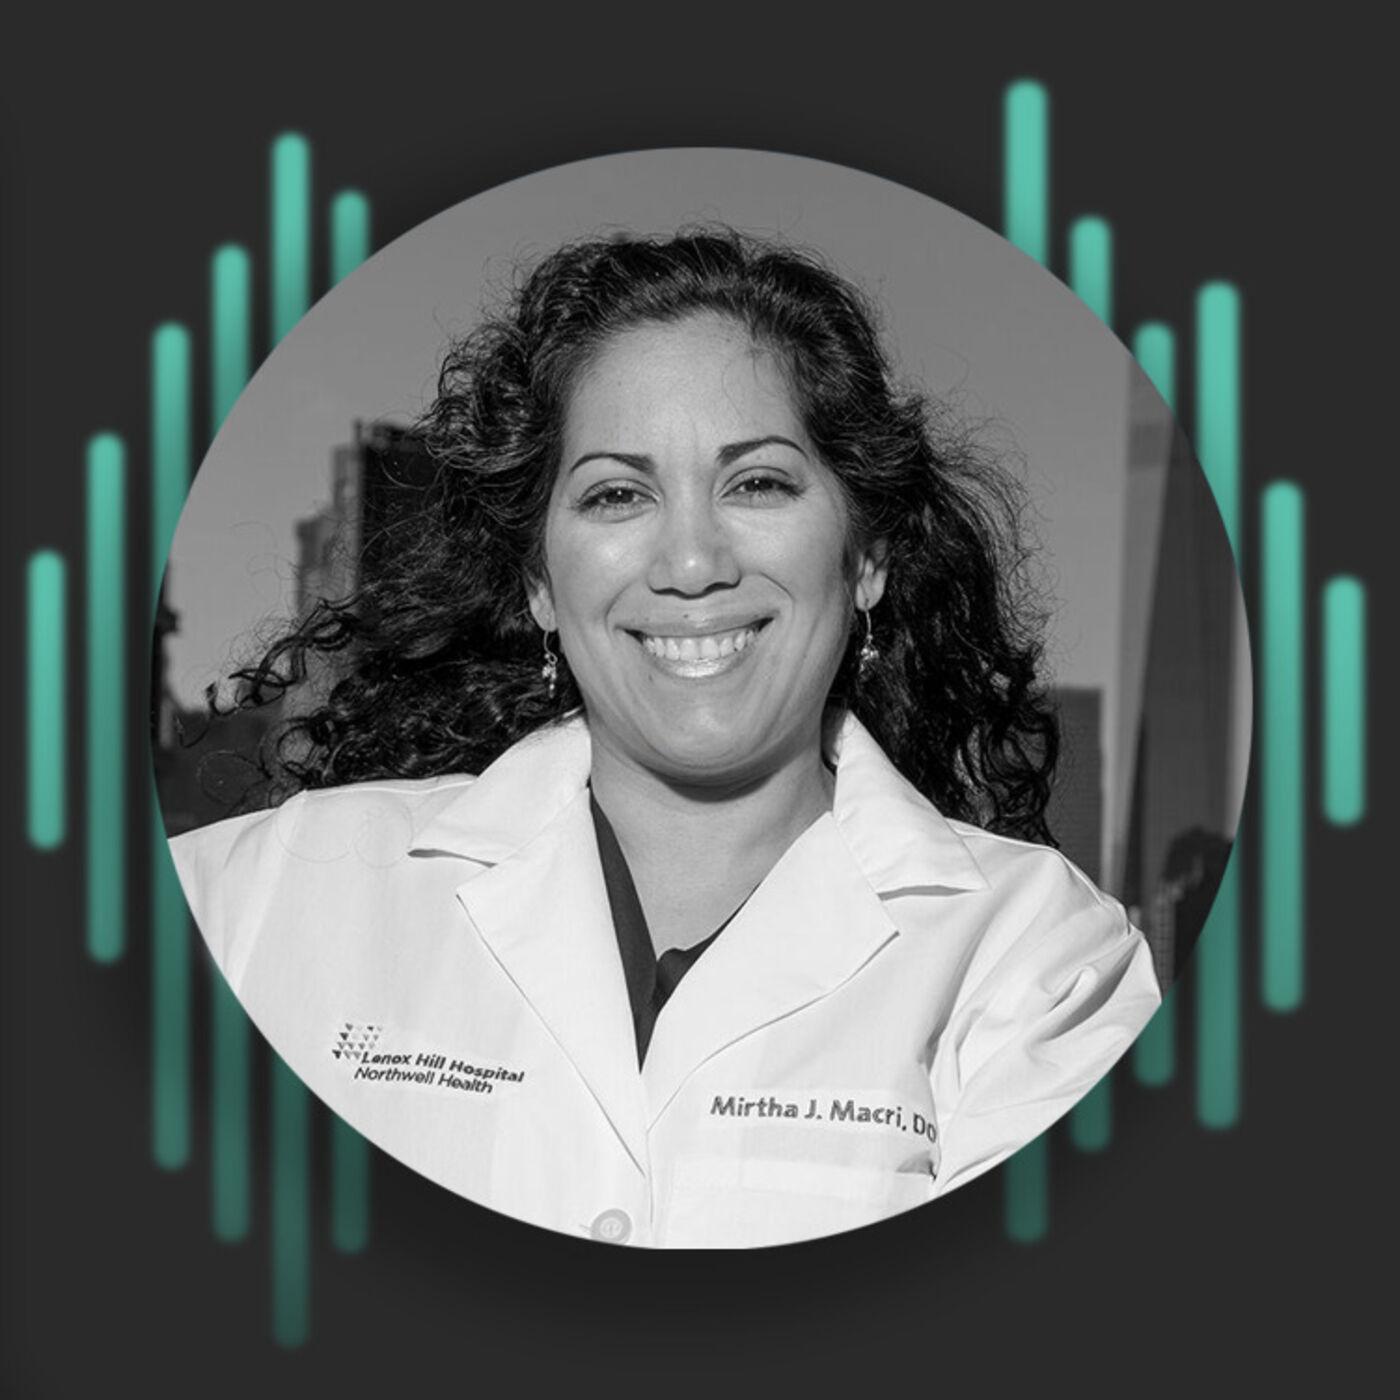 Episode 10: Mirtha Macri D.O. Emergency Medicine Physician